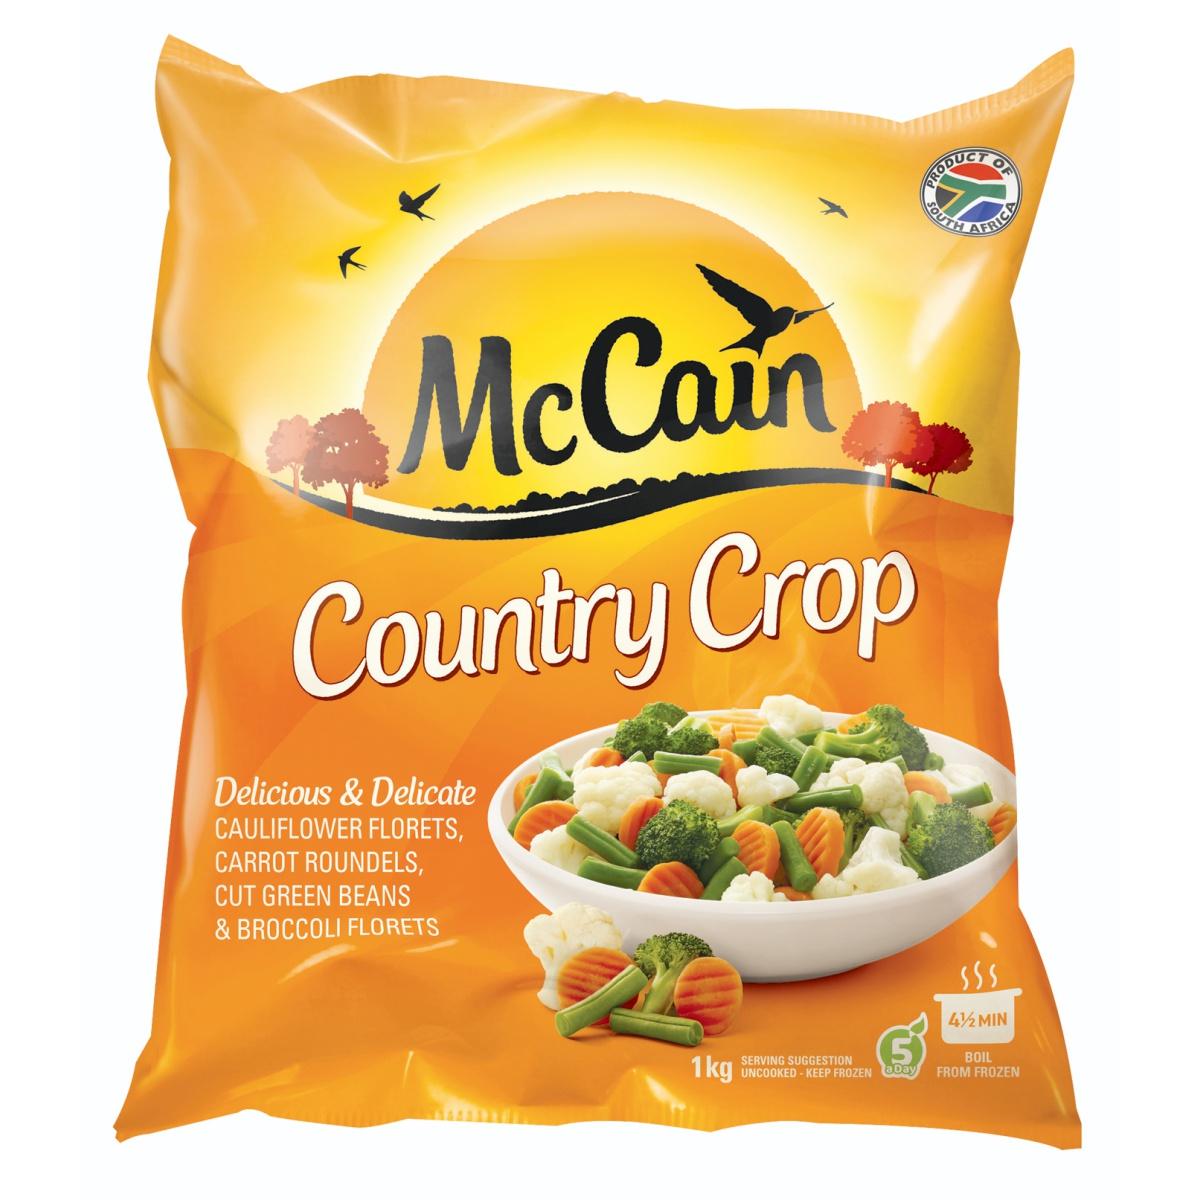 MCCAIN COUNTRY CROP 1KG